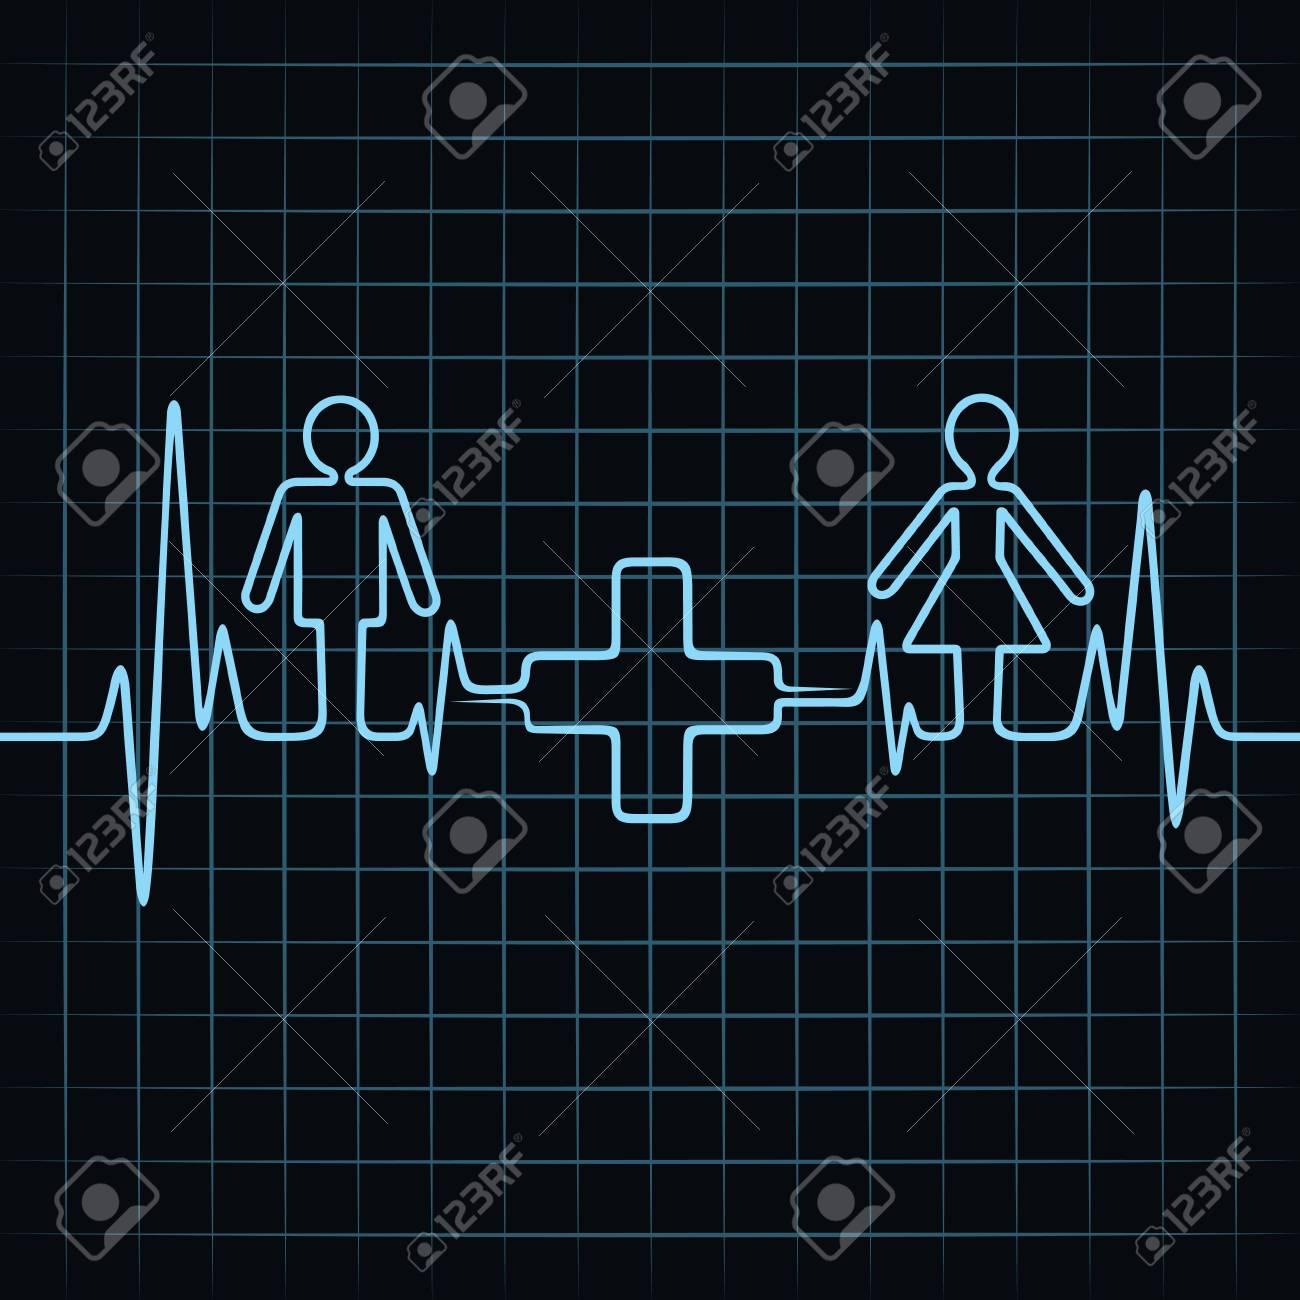 Heartbeat make malefemale and medical symbol royalty free heartbeat make malefemale and medical symbol stock vector 22221779 buycottarizona Images